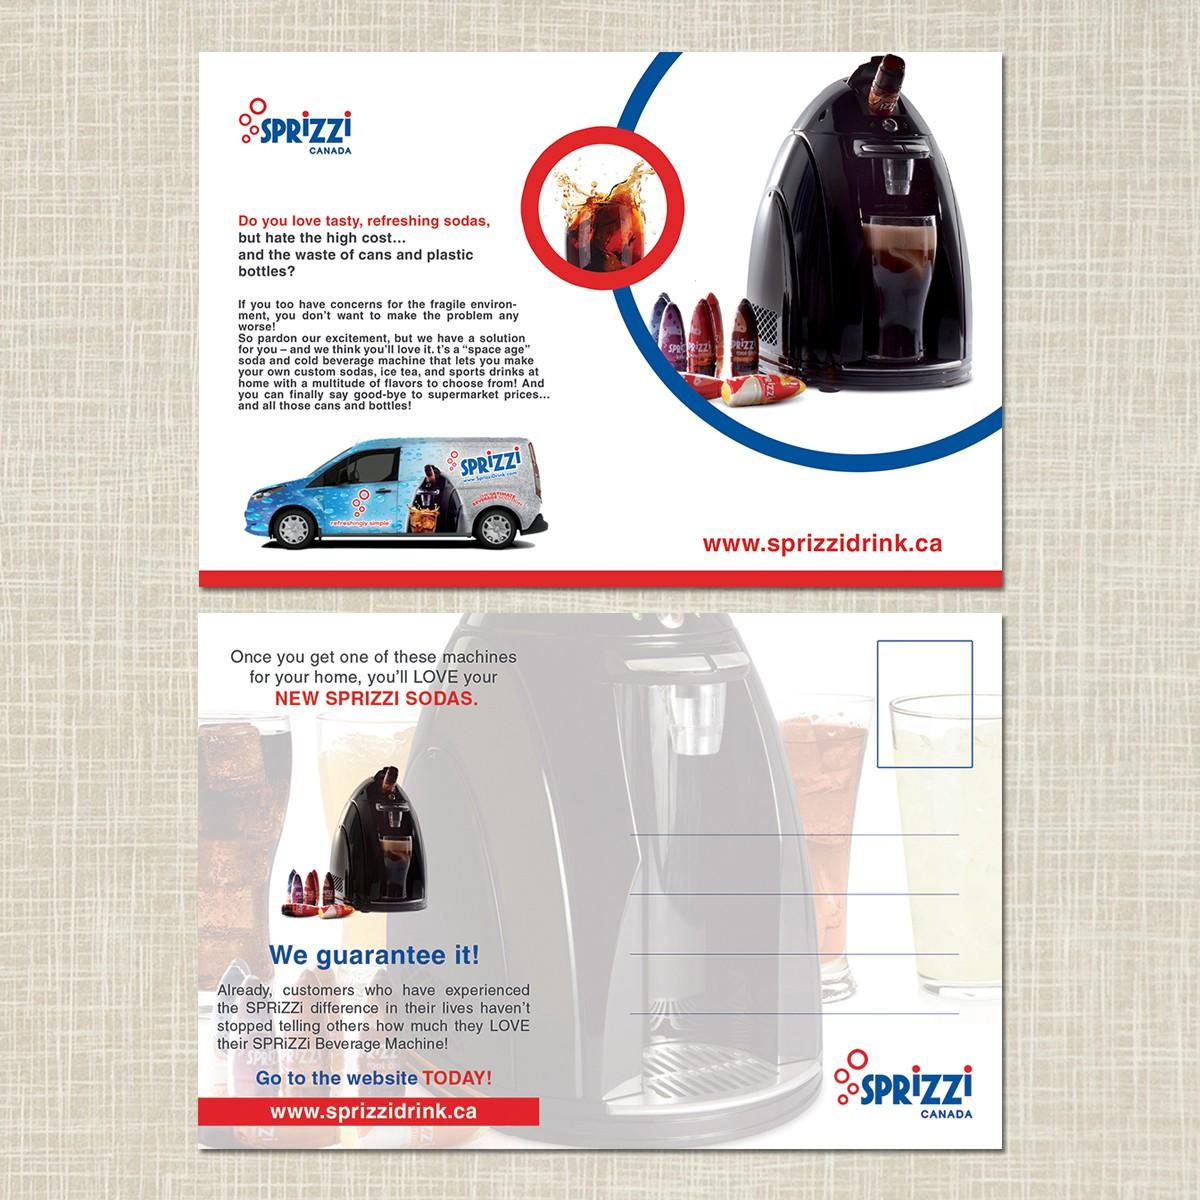 Create a Post Card for Sprizzi Drink Canada Ltd.